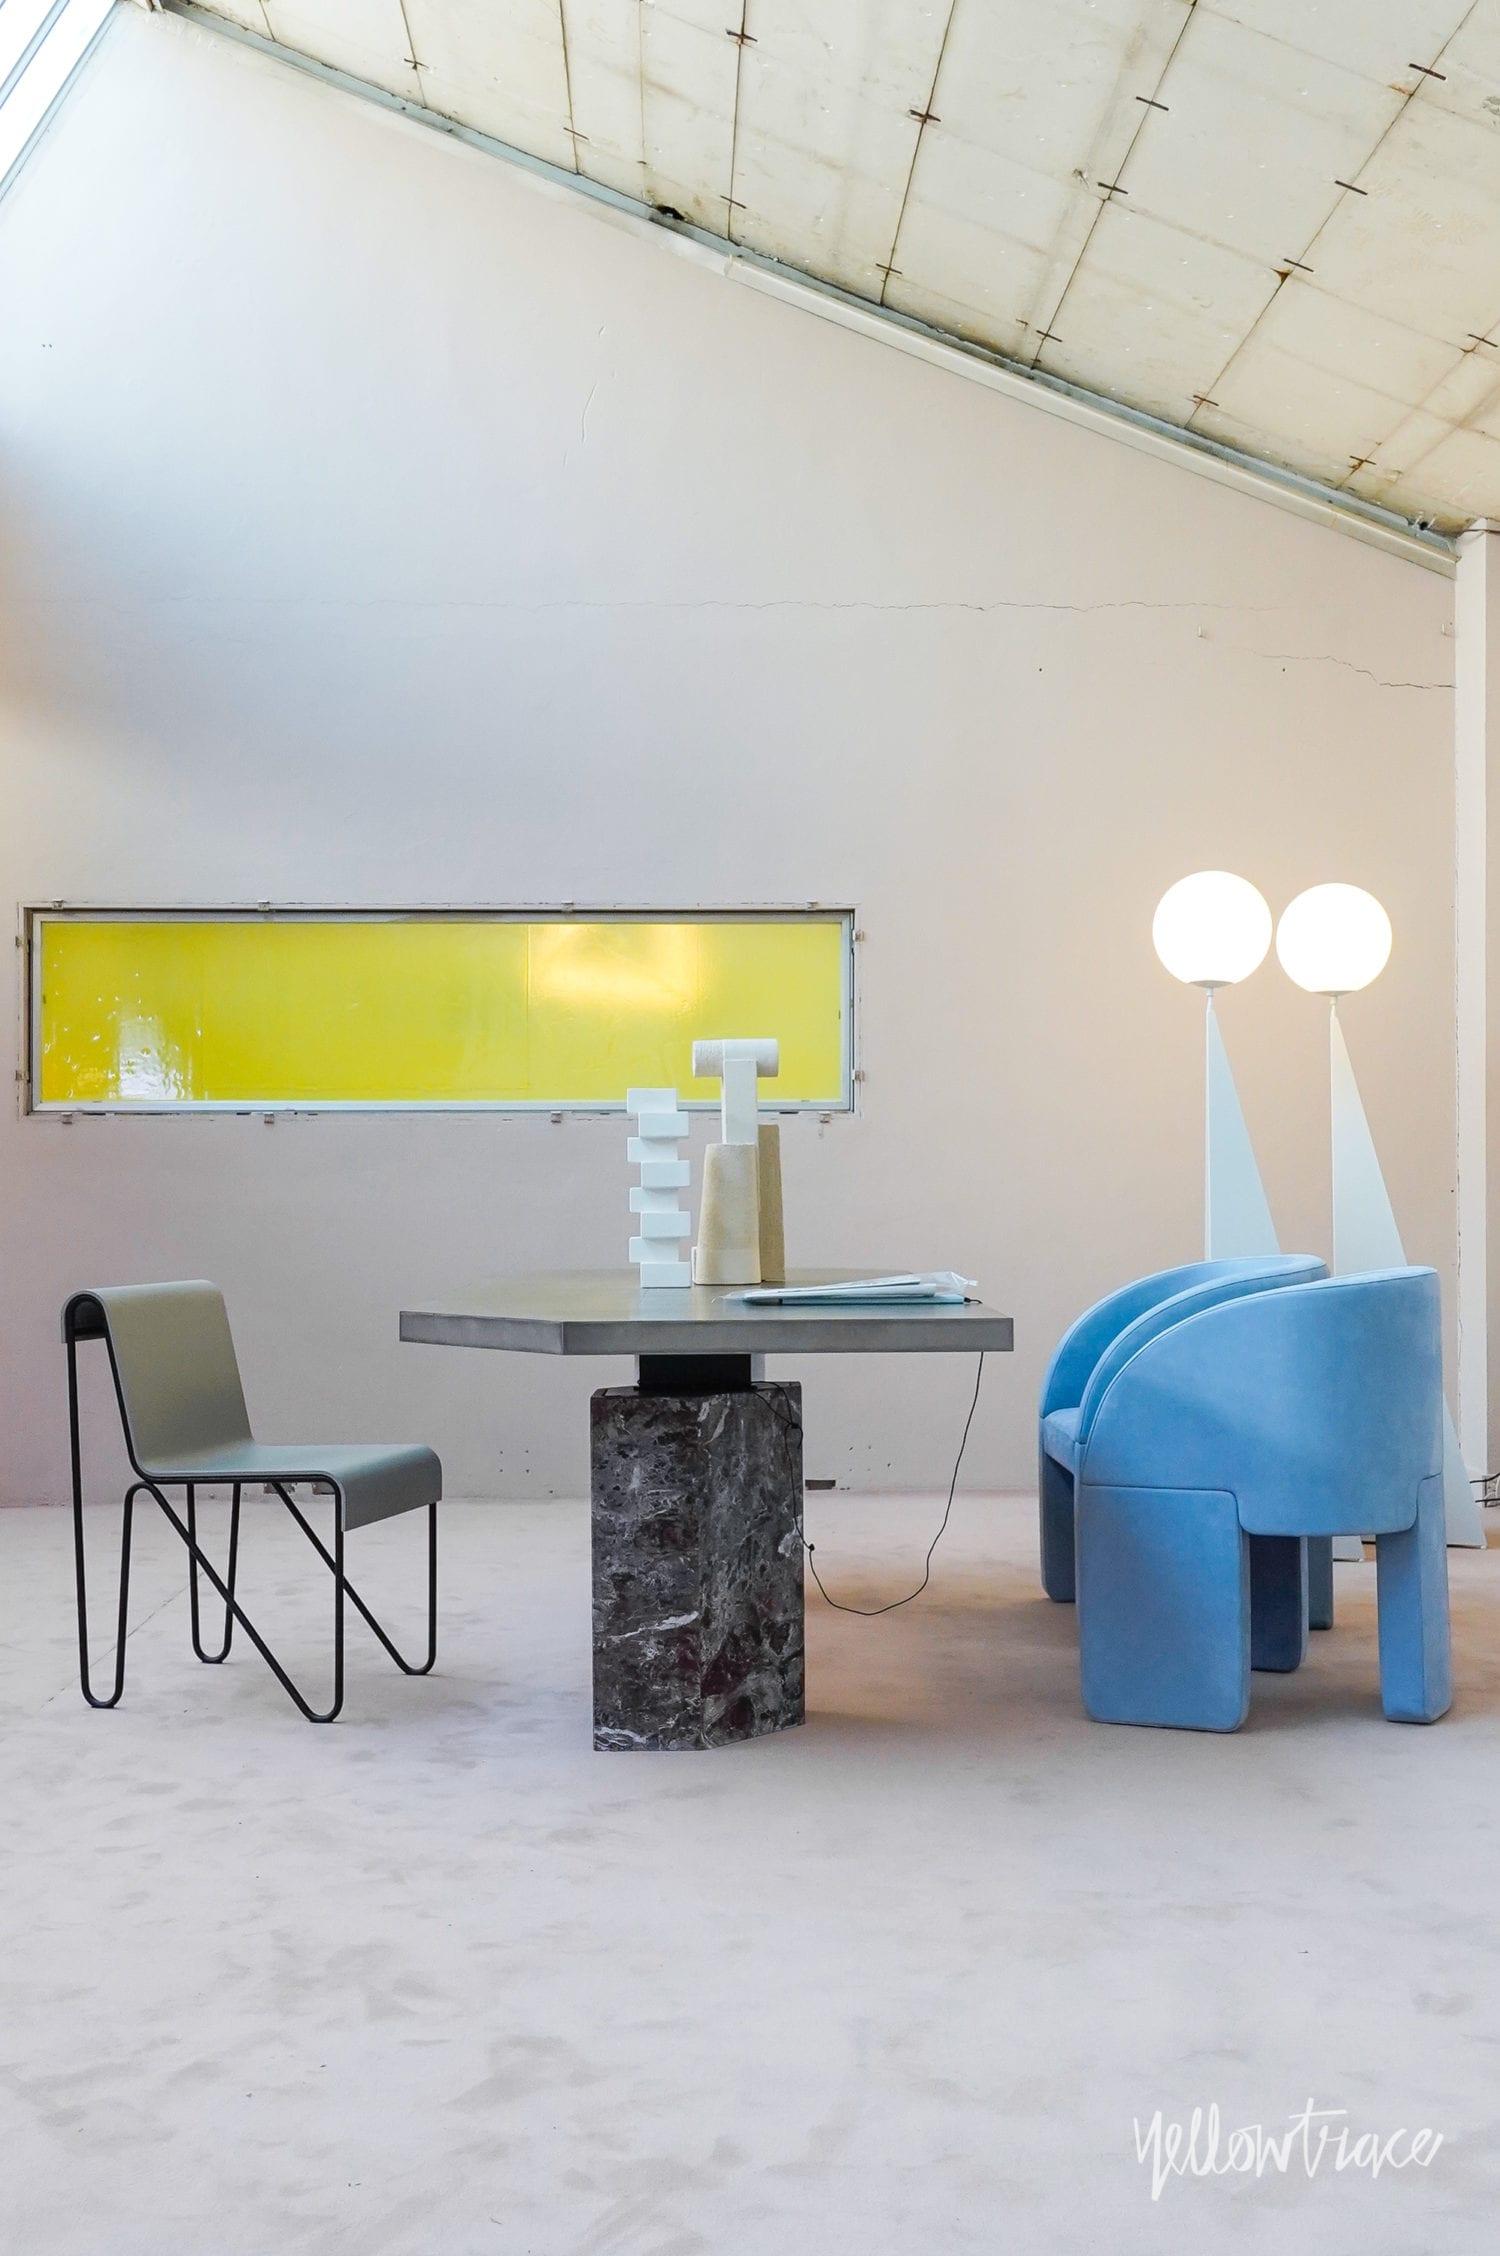 Les Arcanistes Studiopepe At Milan Design Week 2019 Photo Nick Hughes Yellowtrace 06a